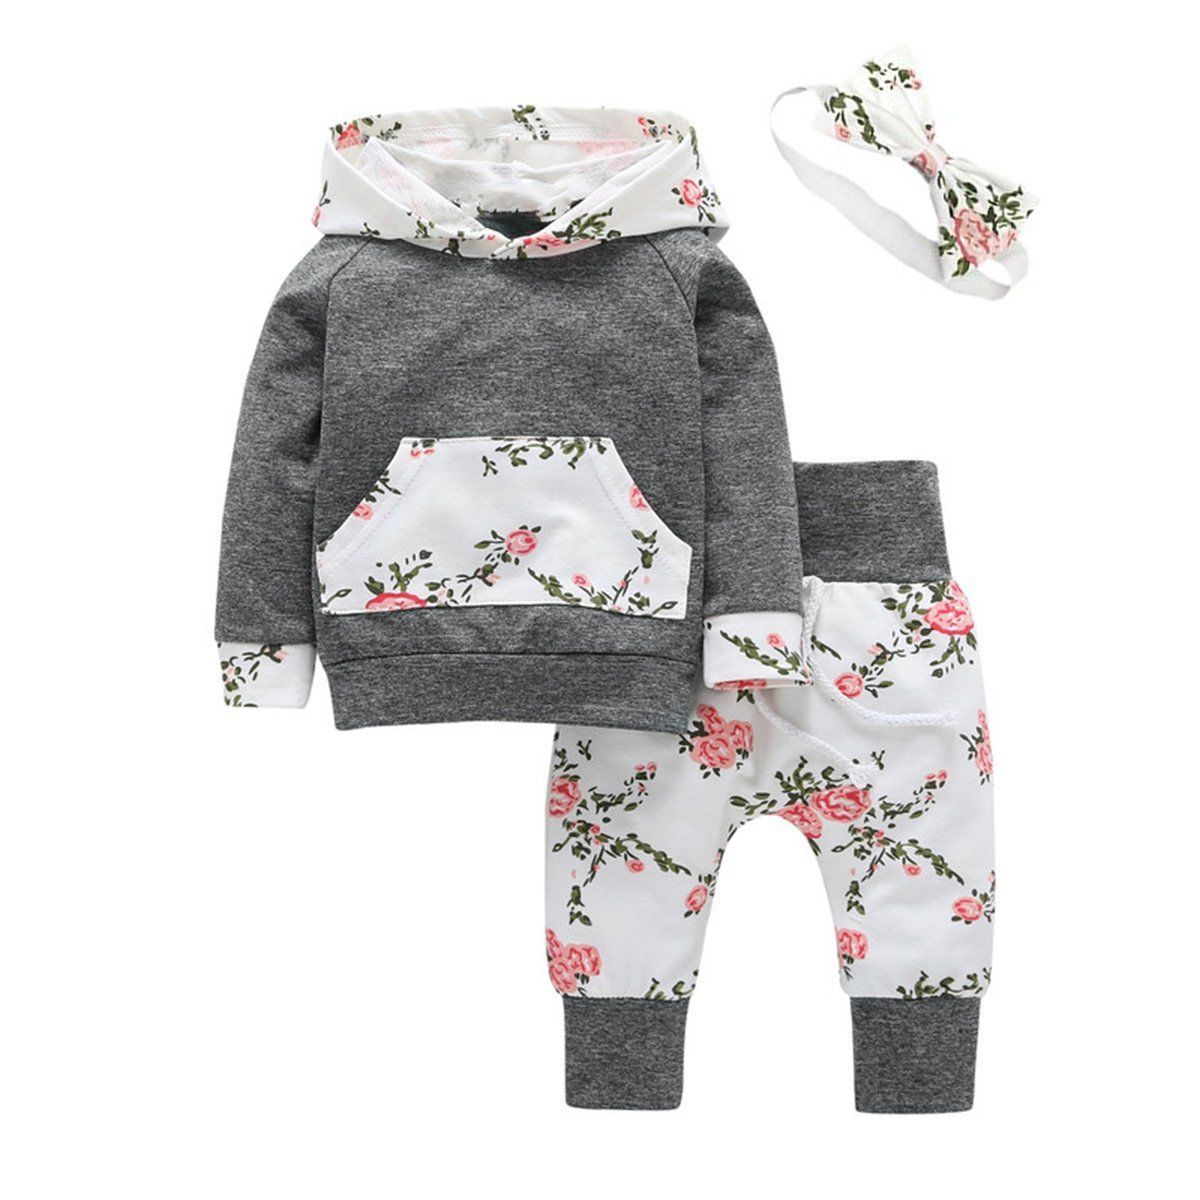 Headband Outfit Set Newborn Toddler Infant Baby Girls Long Sleeve Floral Hoodie Tops Sweatsuit Elastic Pants